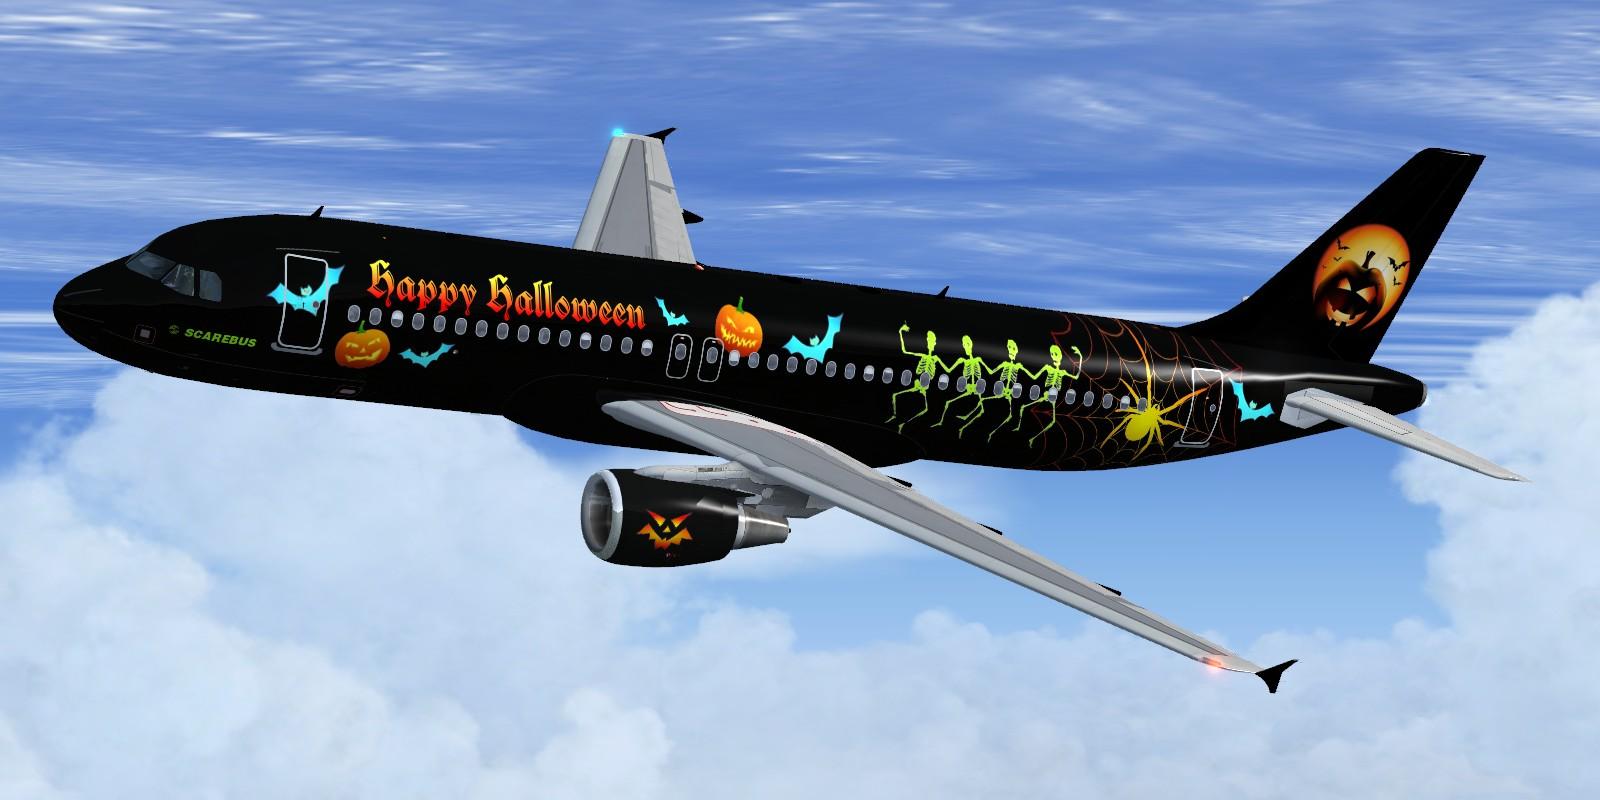 fs-freeware net - FSX Project Airbus A320 Halloween (fictional)